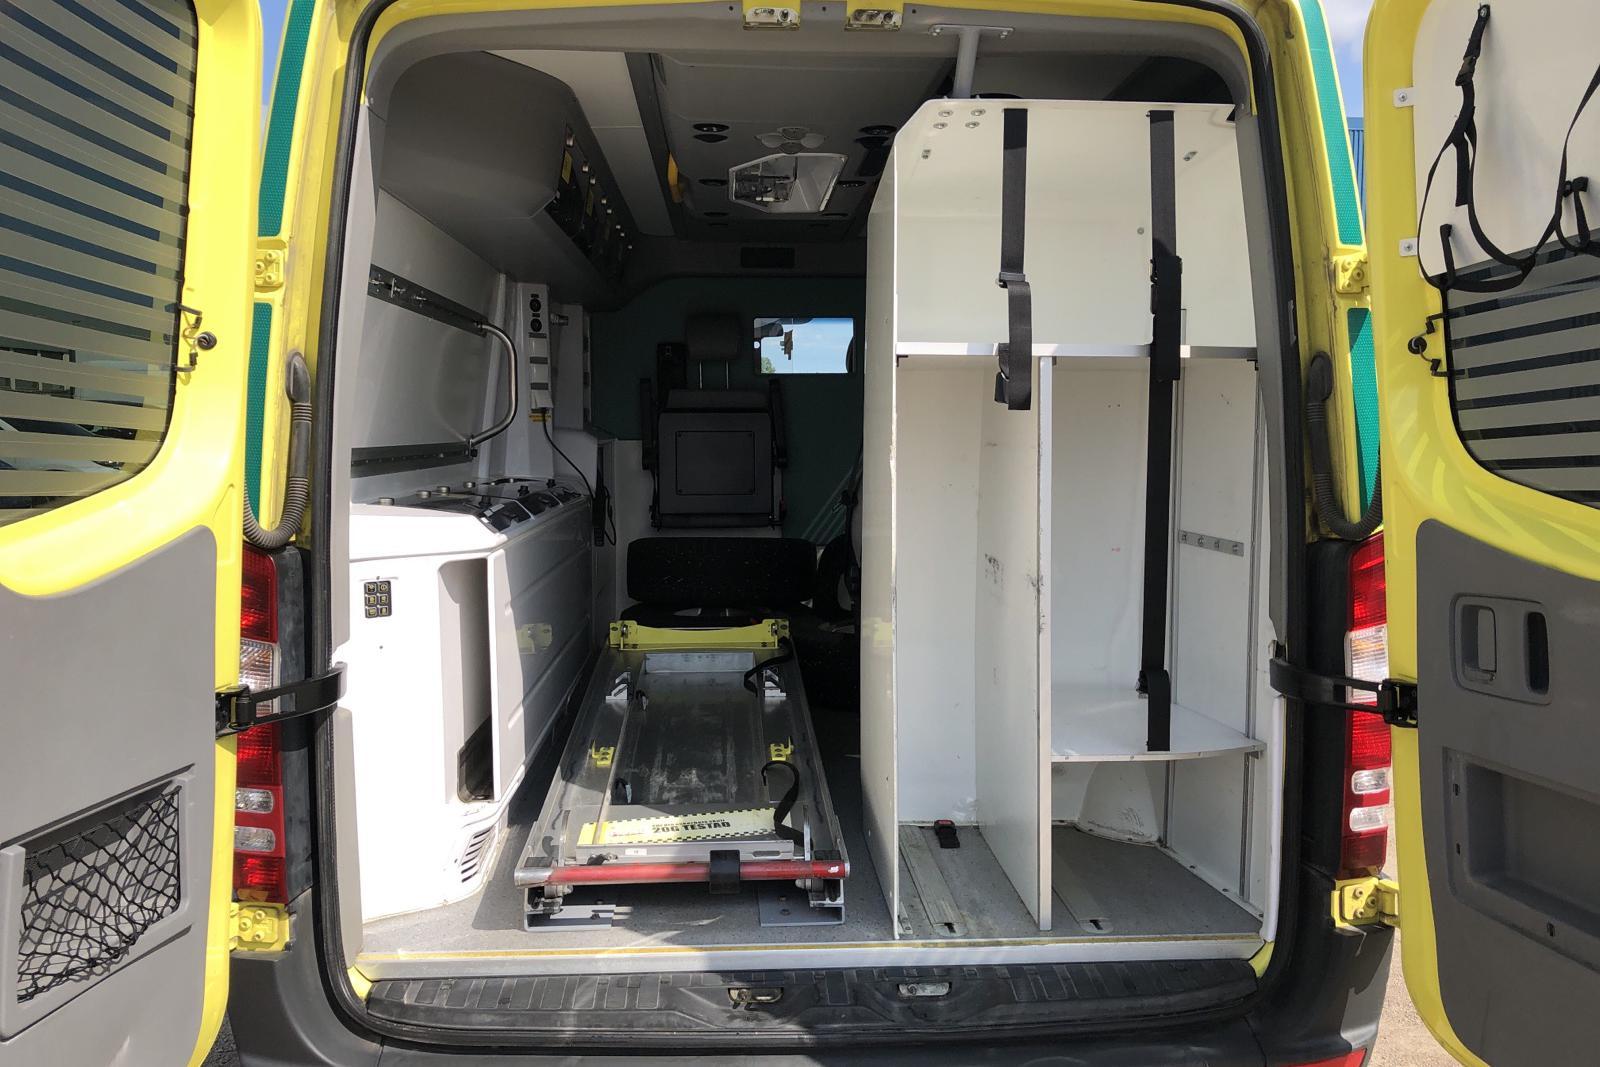 Mercedes Sprinter Ambulans 316 CDI (163hk) - 44 908 mil - Automat - gul - 2014